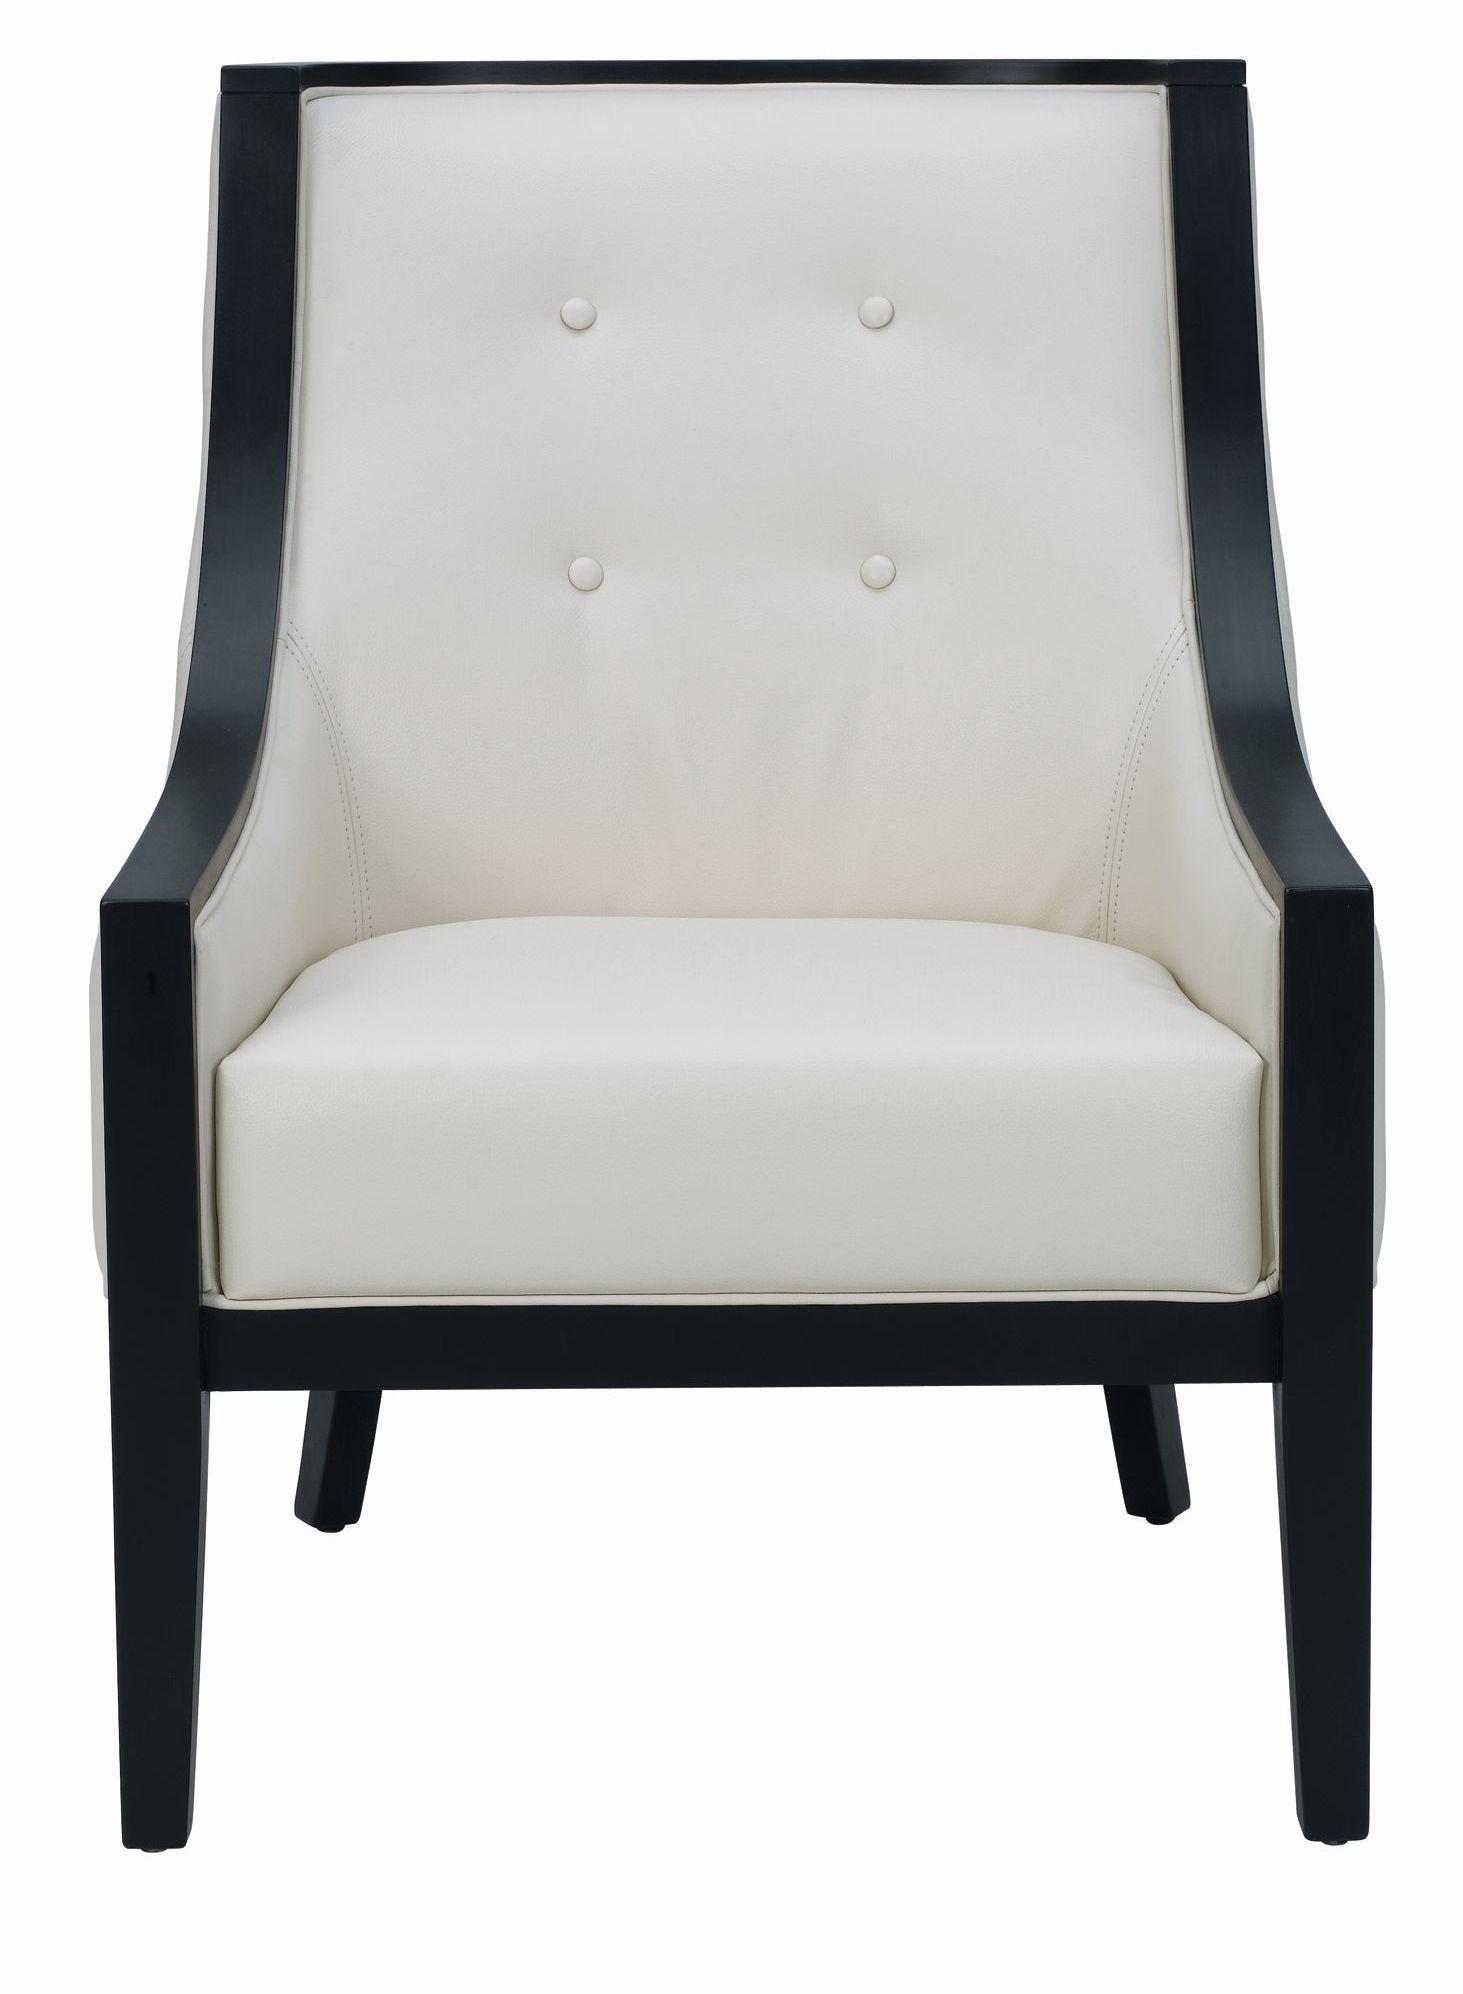 Cyrano cream leather arm chair from sunpan 27233 for Cream armchair